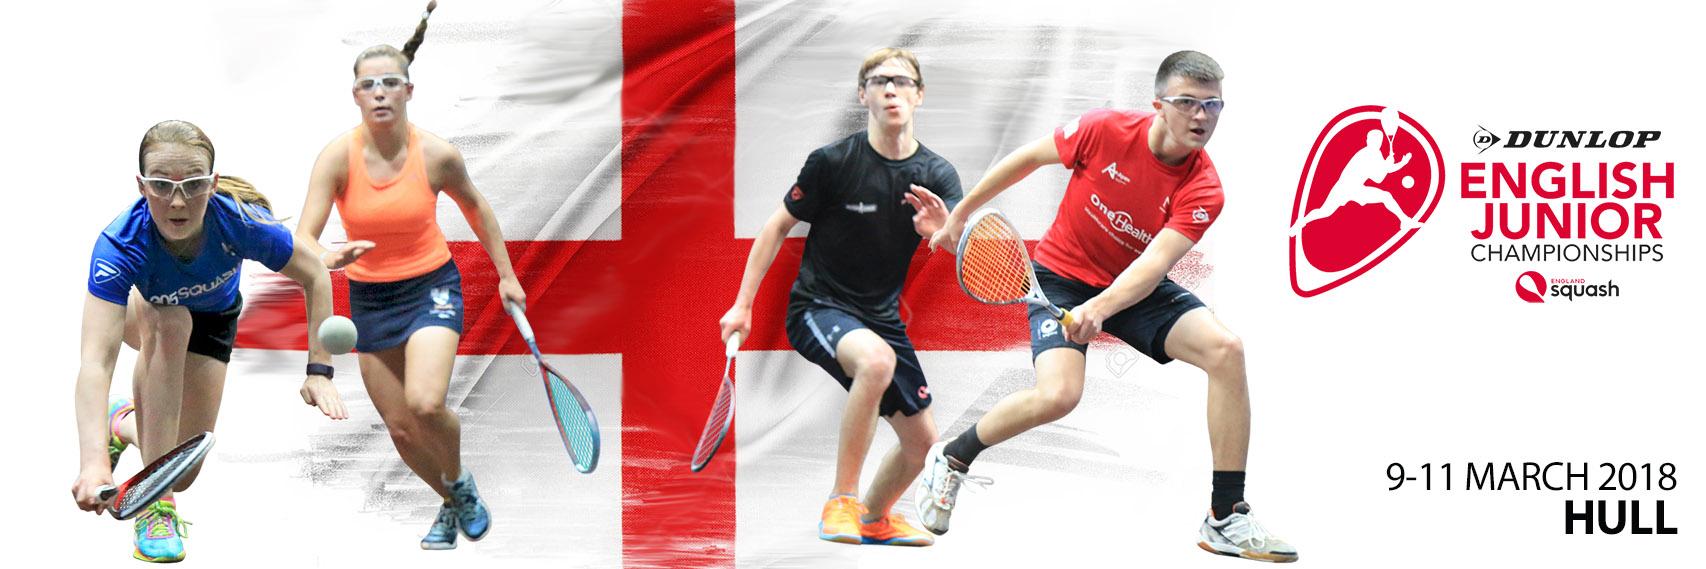 Dunlop English Junior Championships